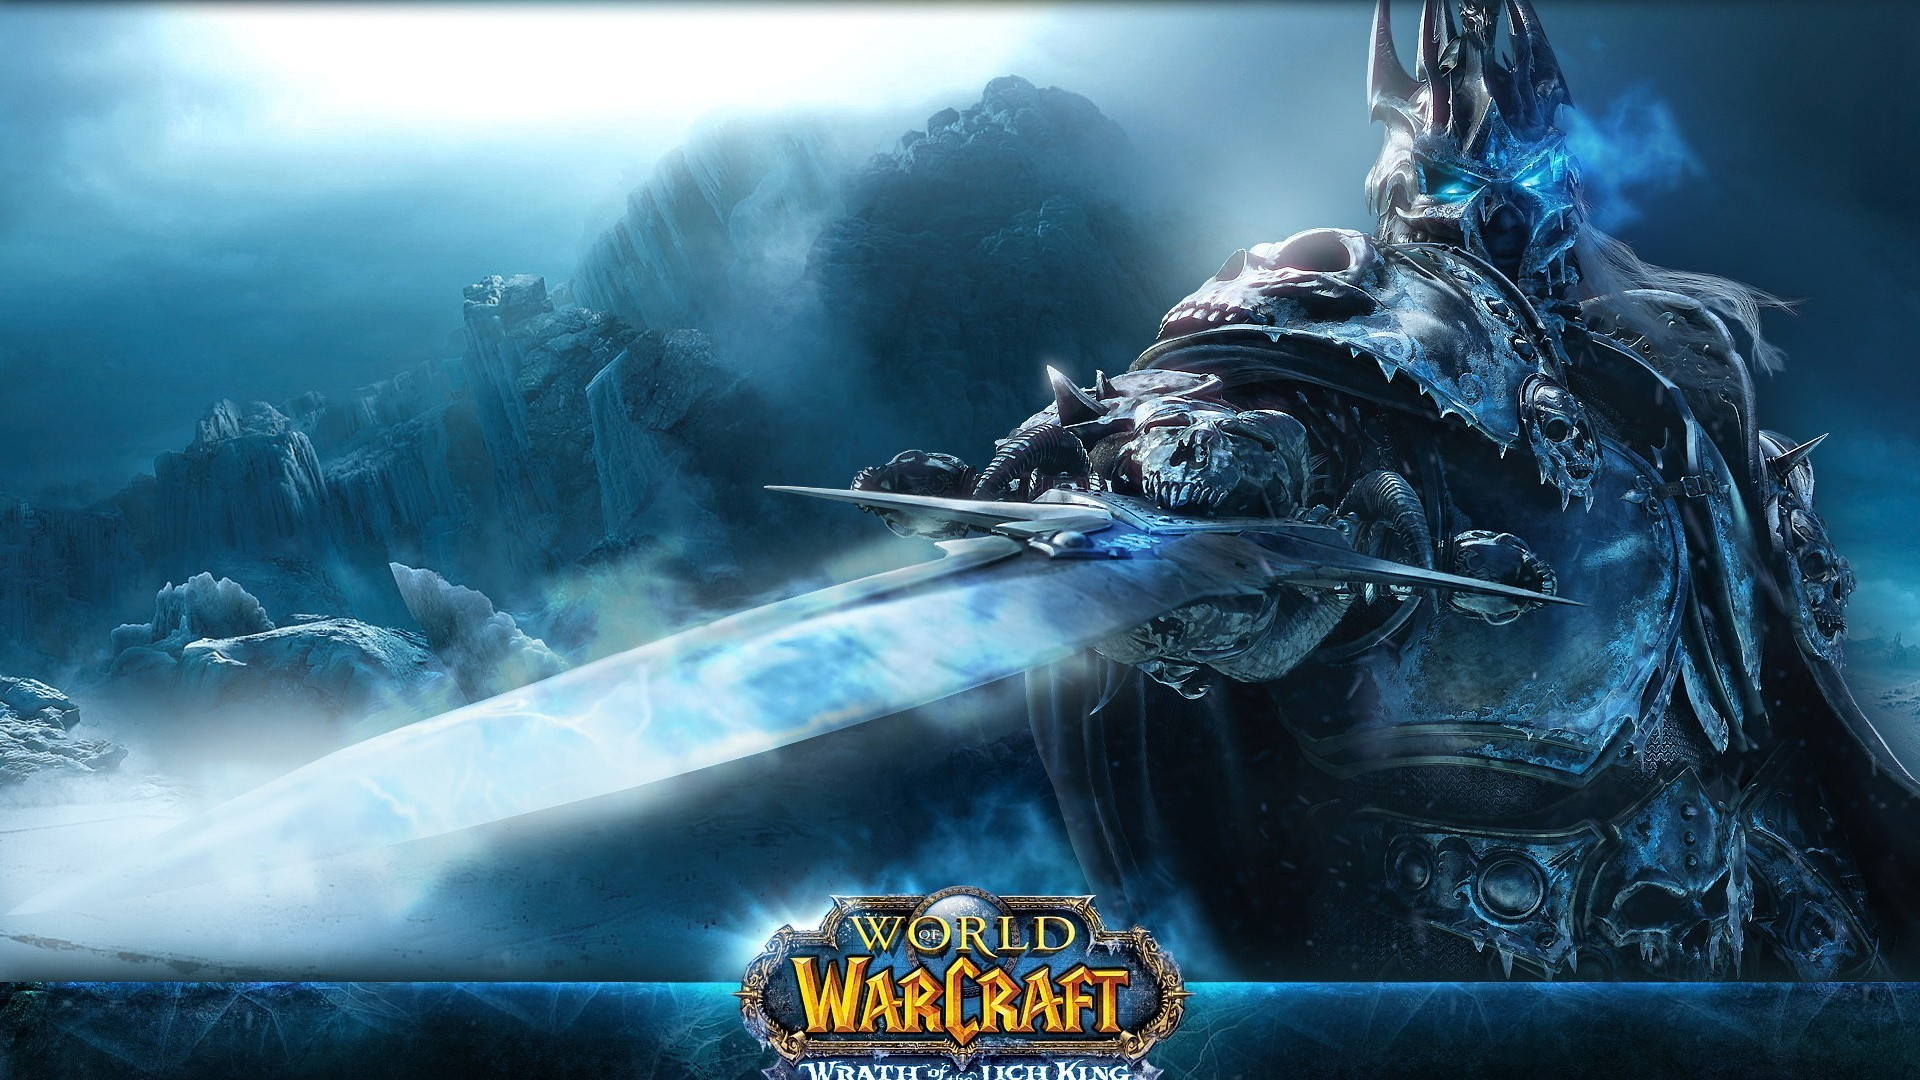 world of warcraft wallpaper mobile